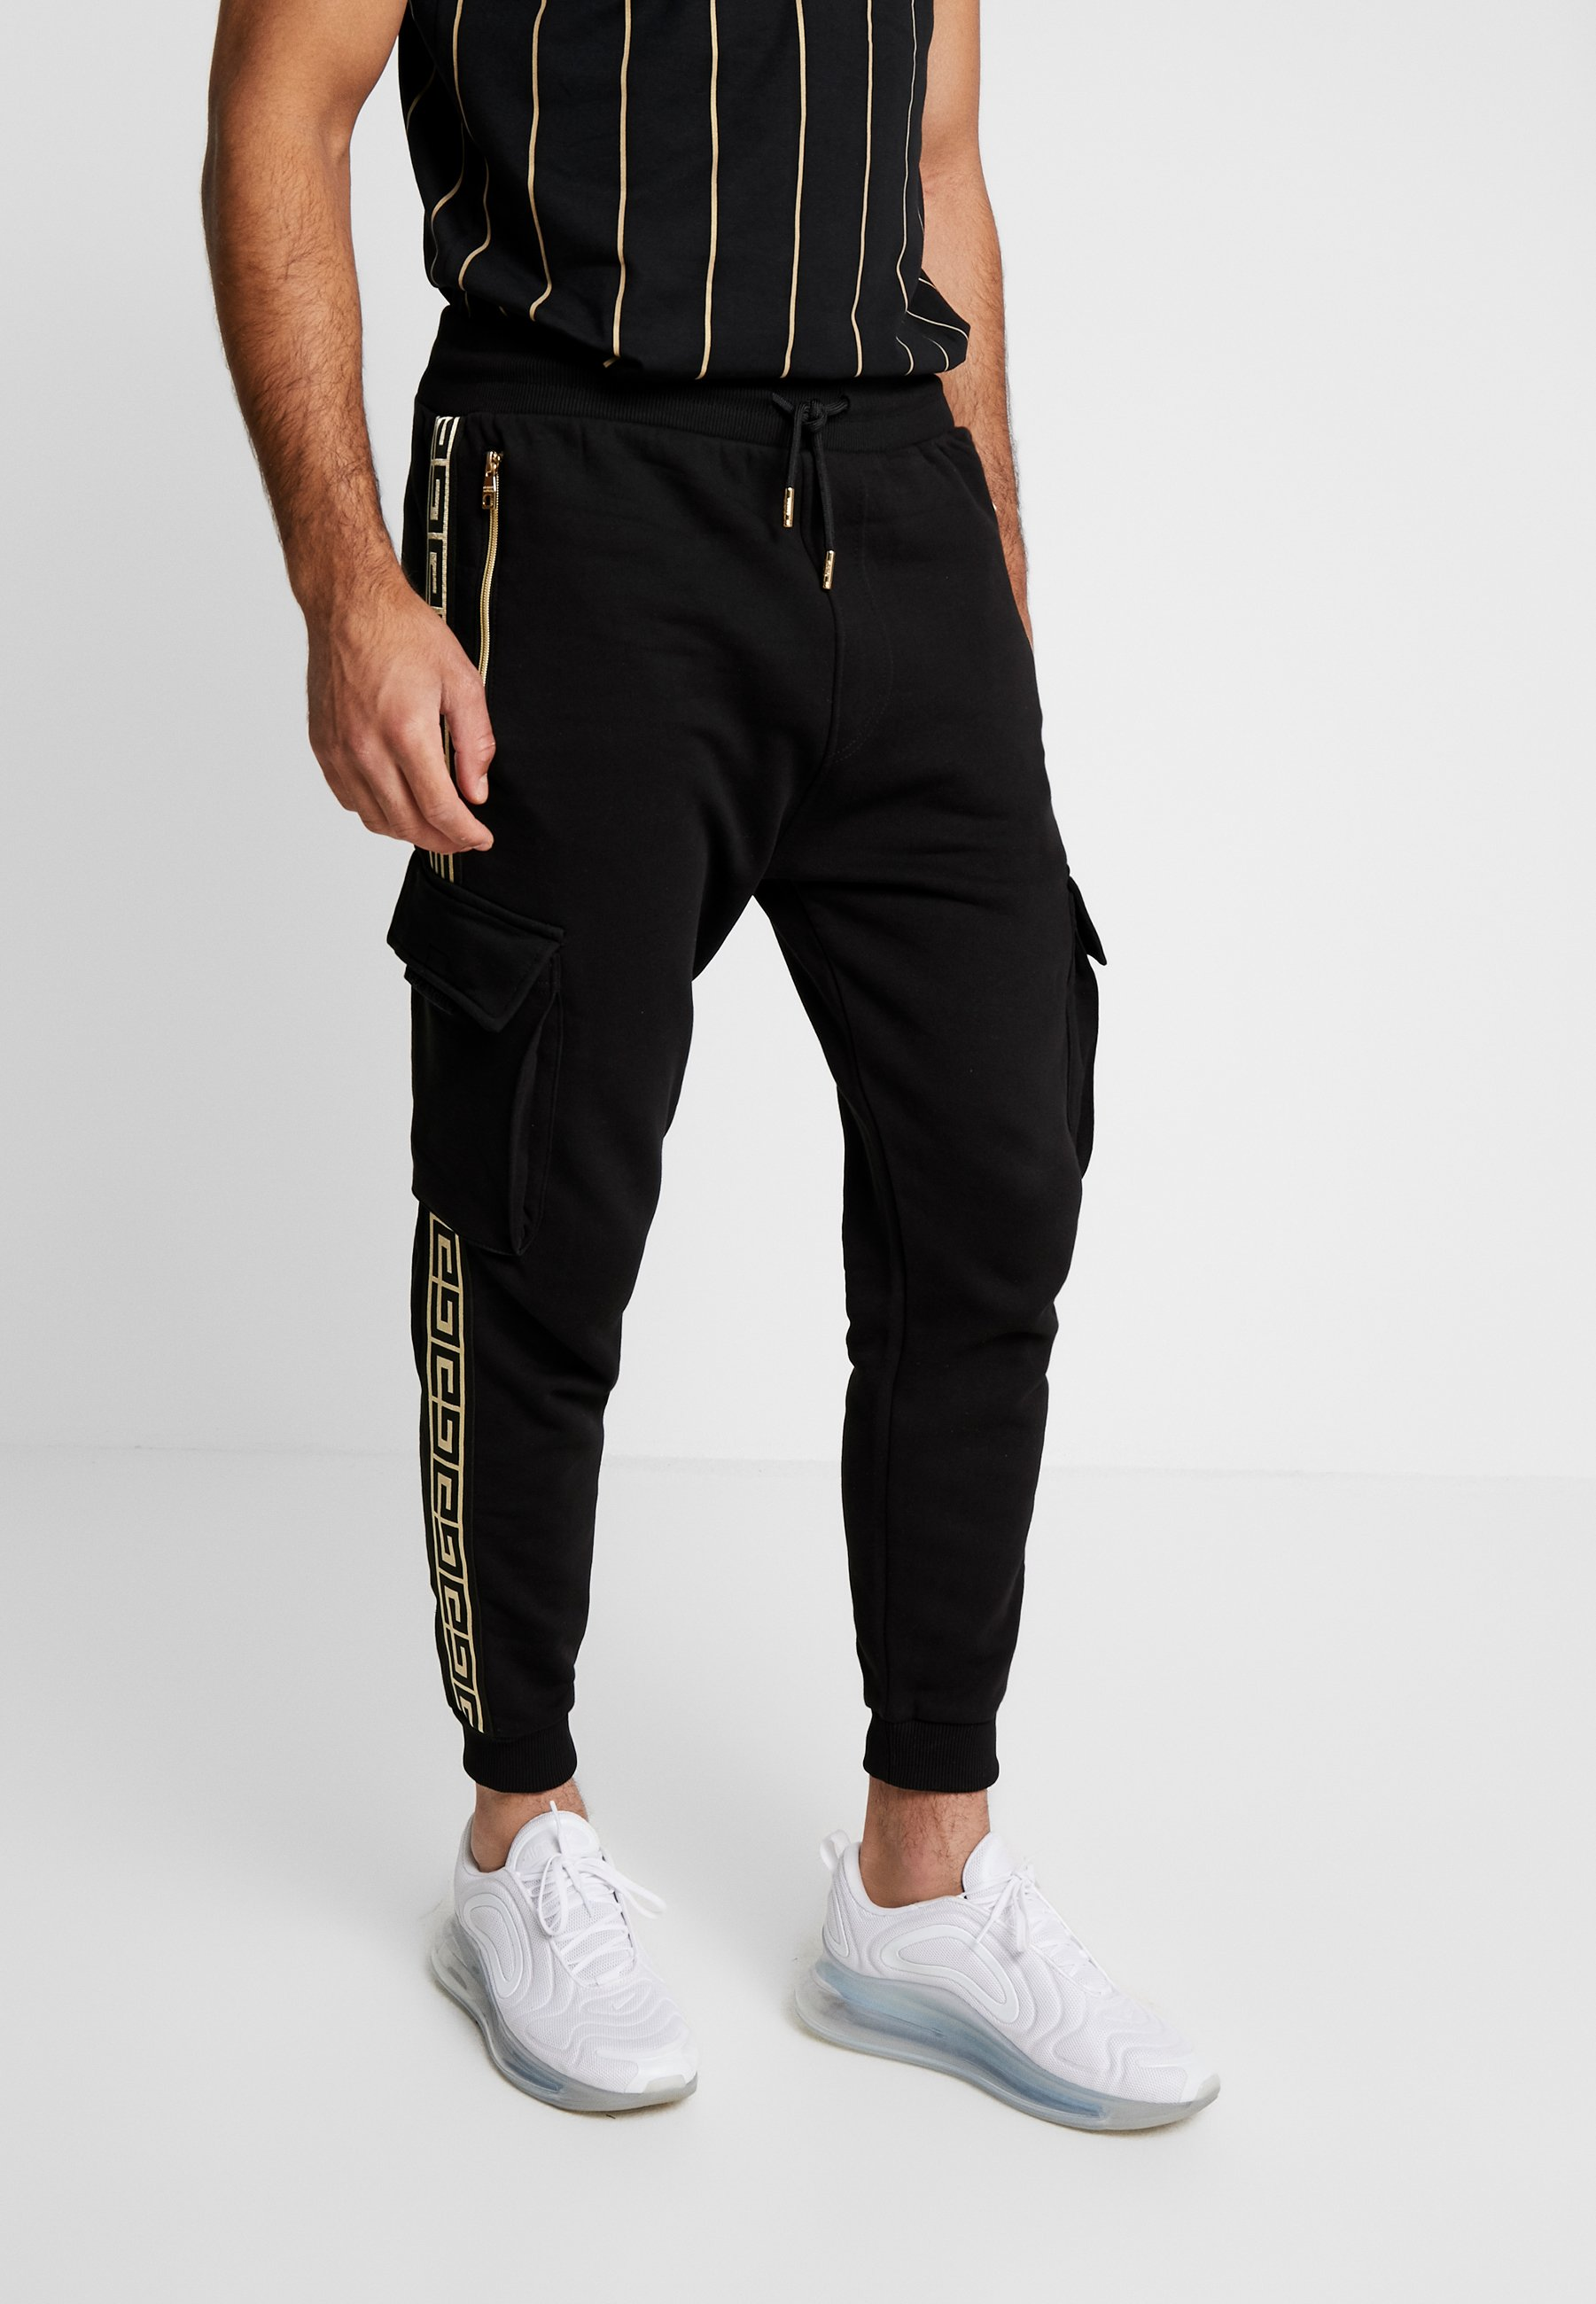 Alpha Glorious De JoggerPantalon Black Gangsta Survêtement m80Nnw